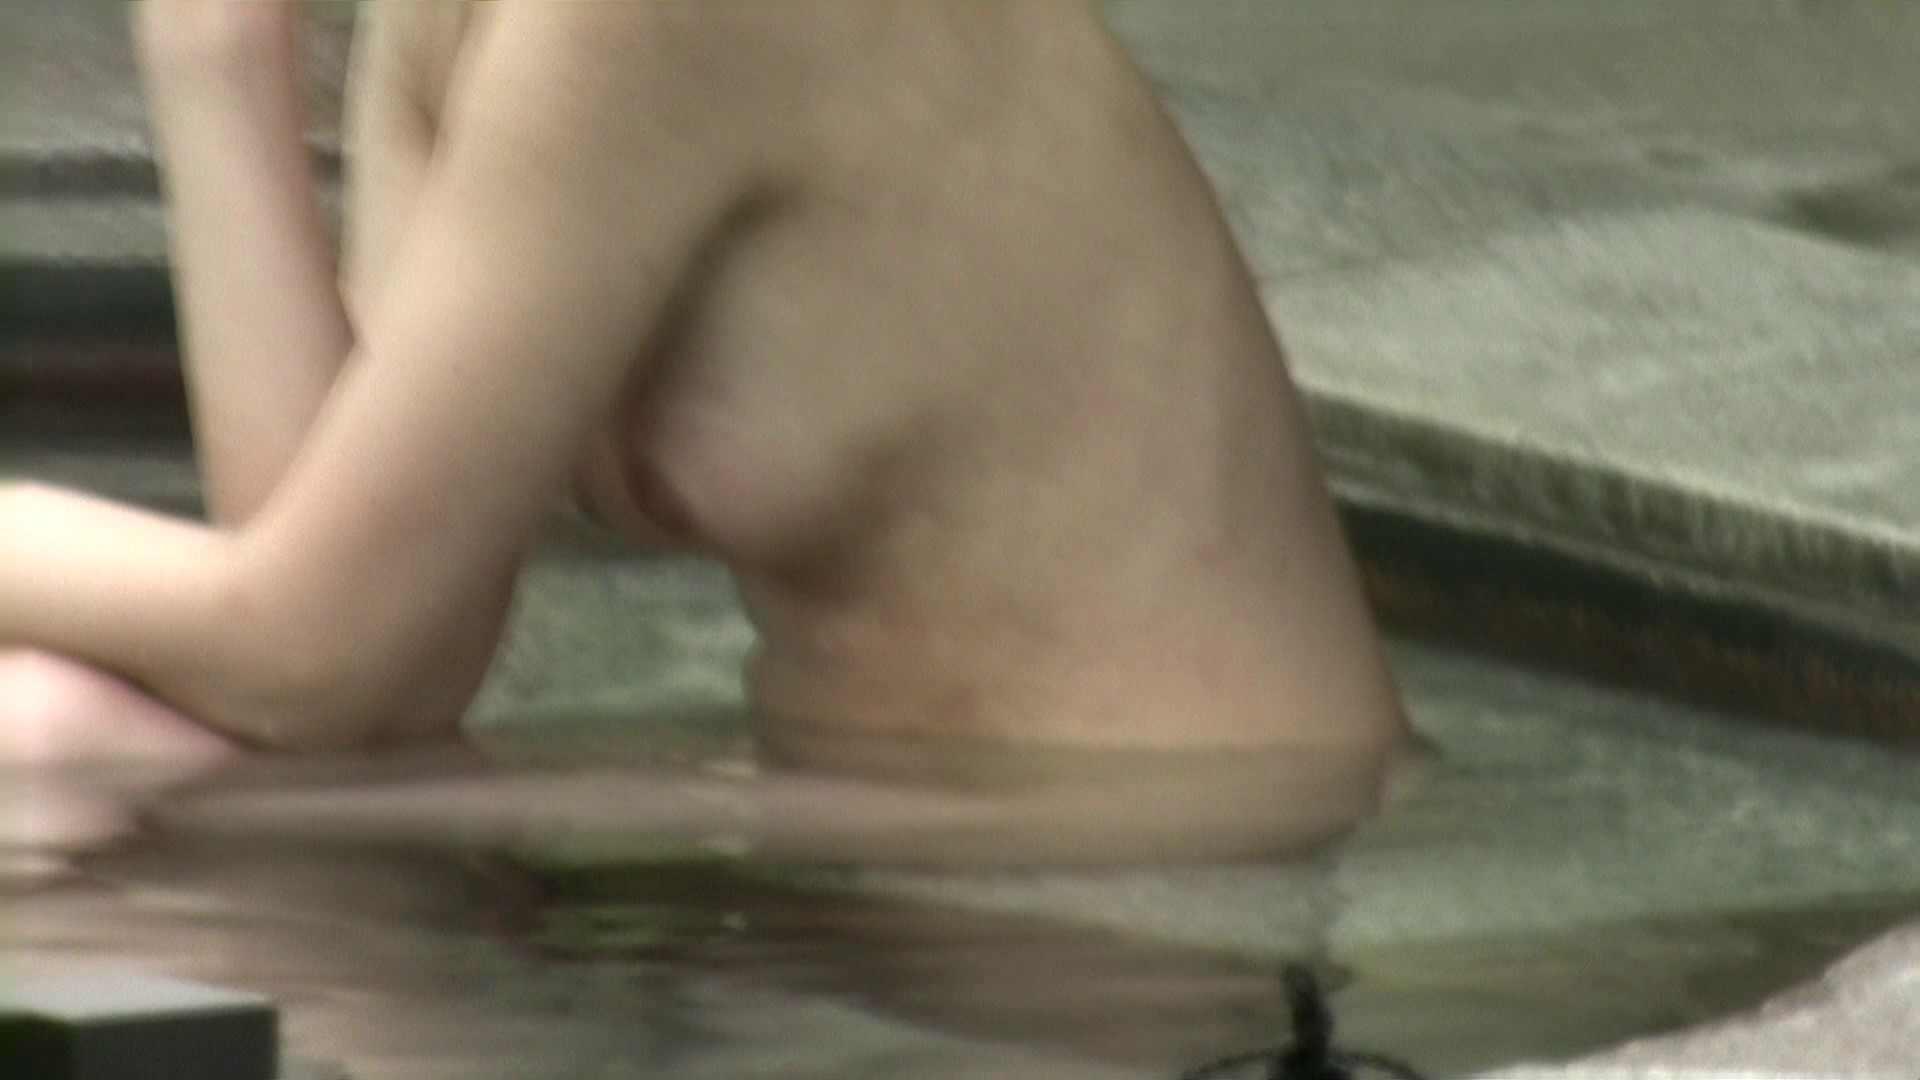 Aquaな露天風呂Vol.661 OLセックス | 露天  105画像 25